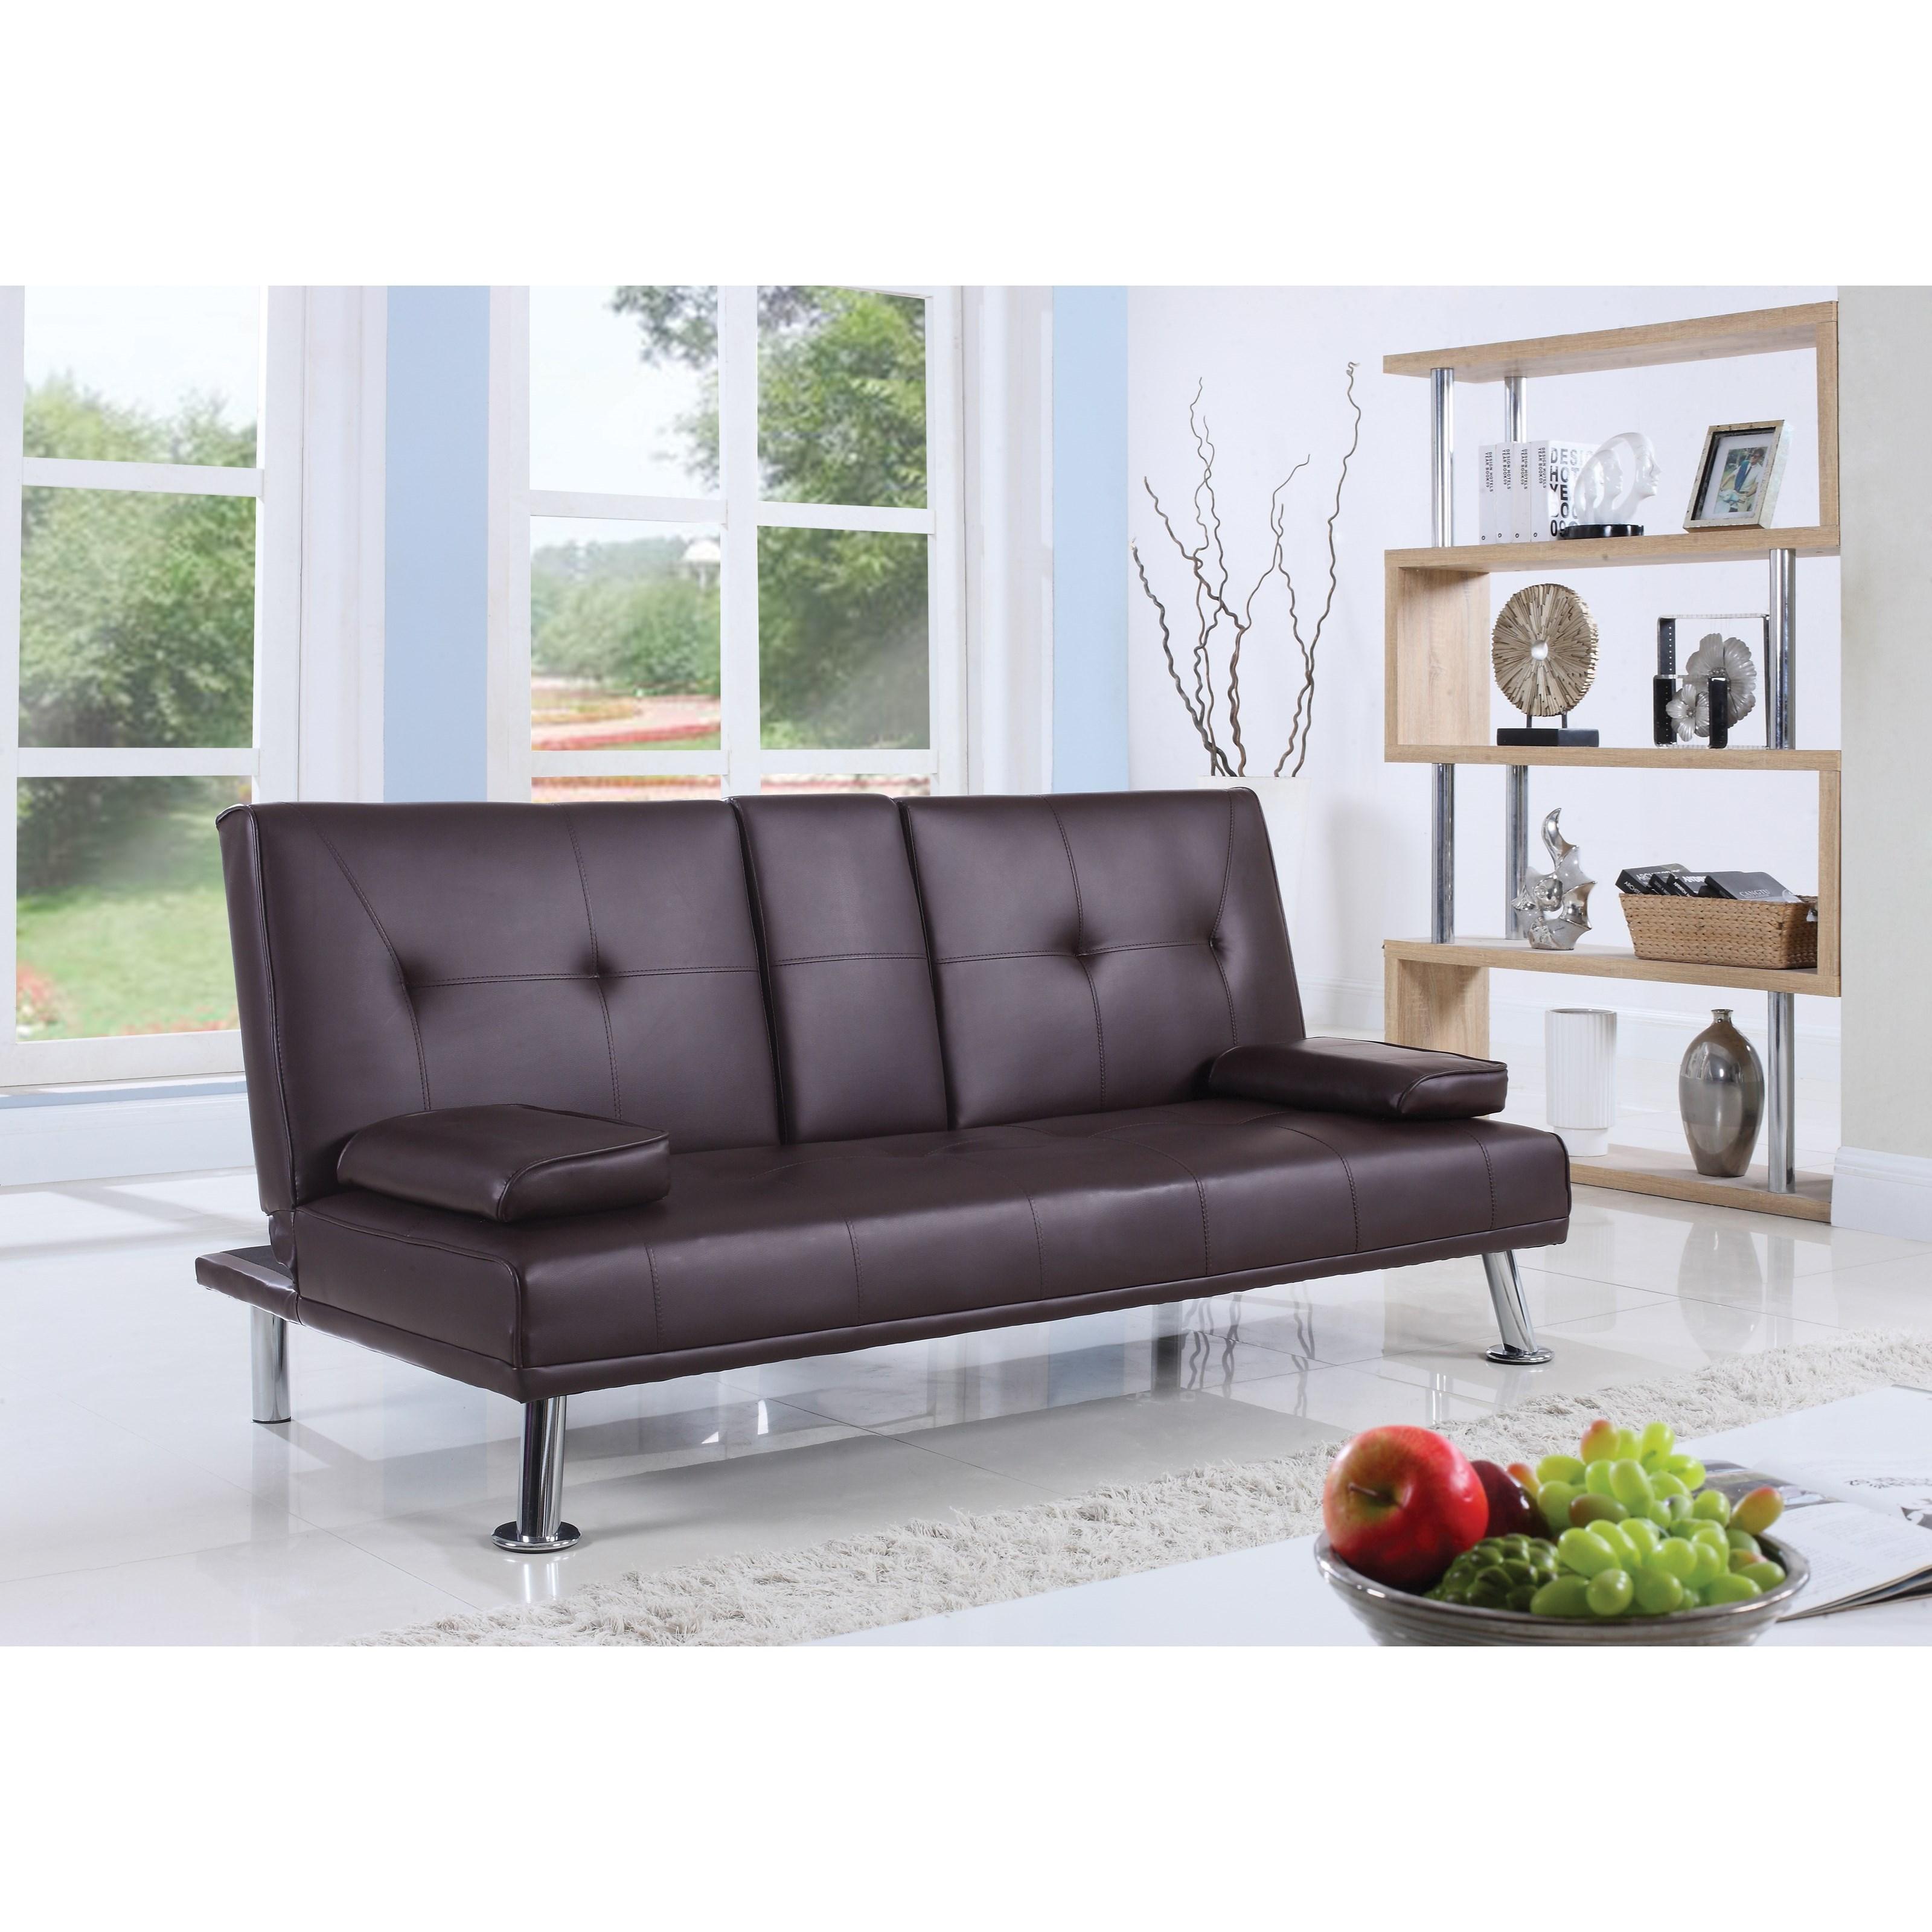 Coaster Futons Sofa Bed - Item Number: 300692